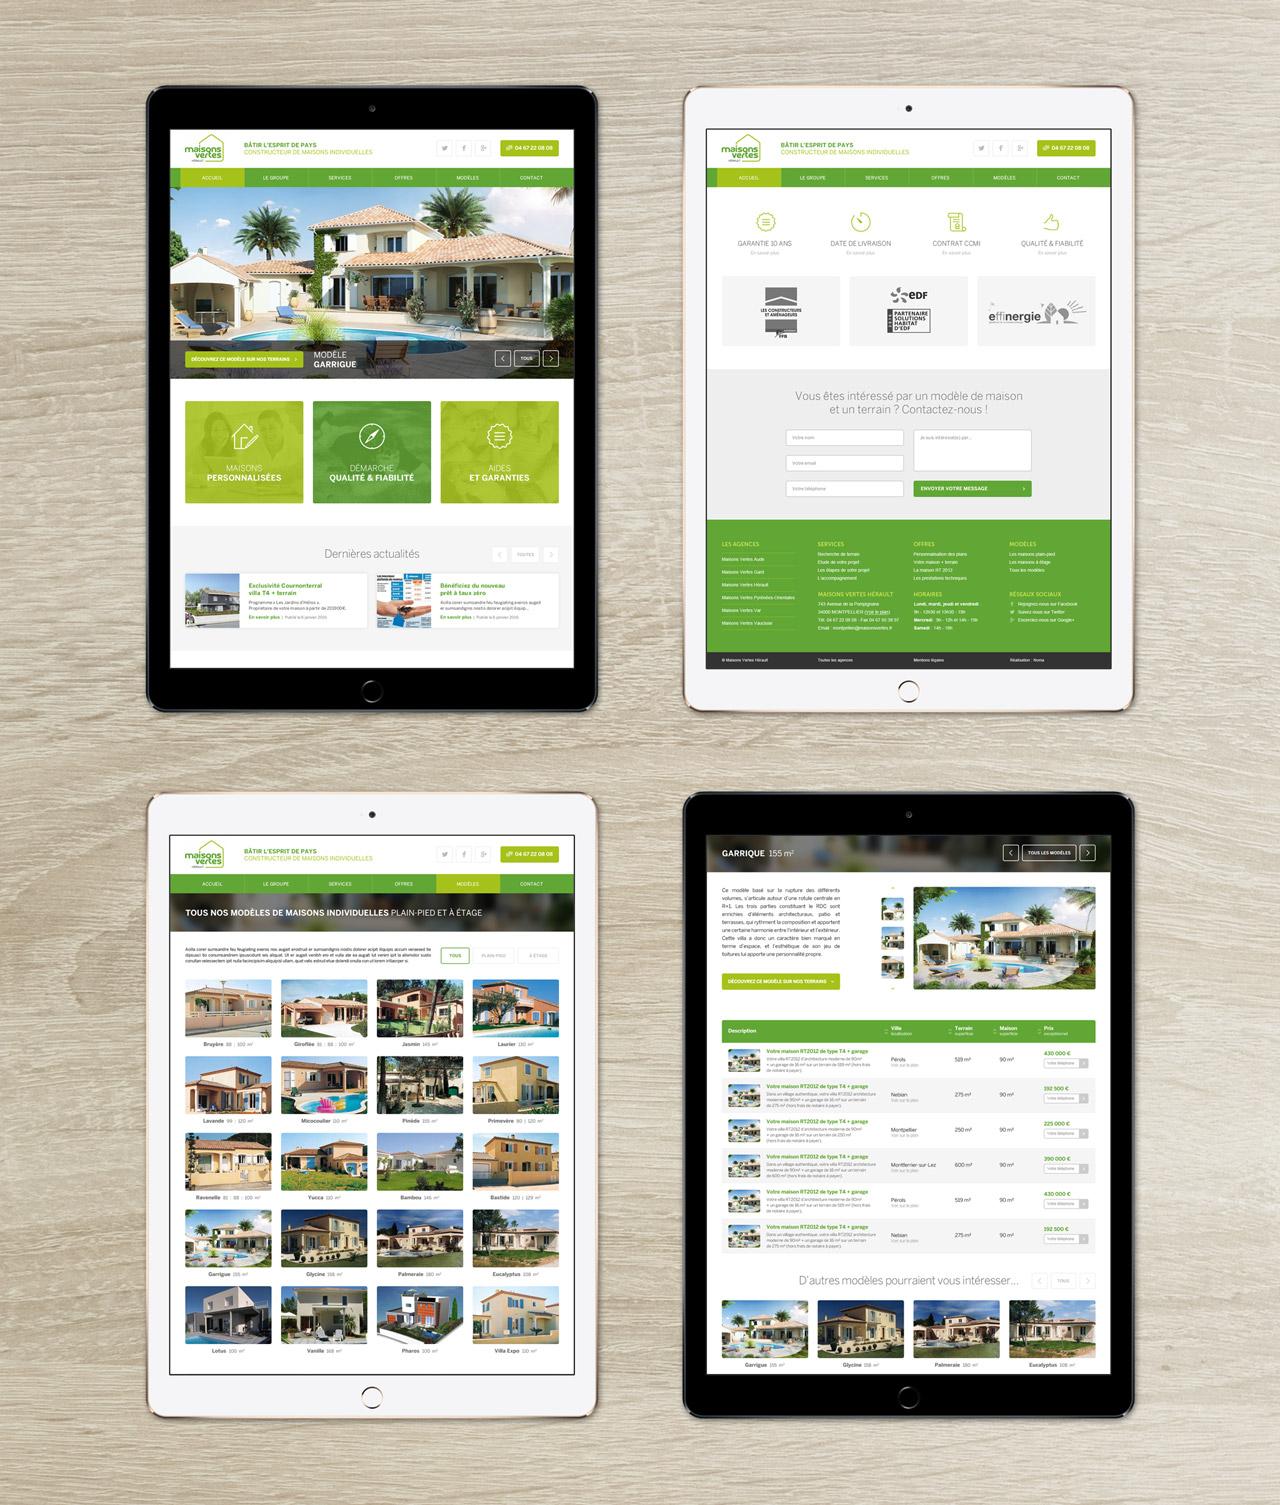 maisons-vertes-creation-site-internet-responsive-design-caconcept-alexis-cretin-graphiste-montpellier